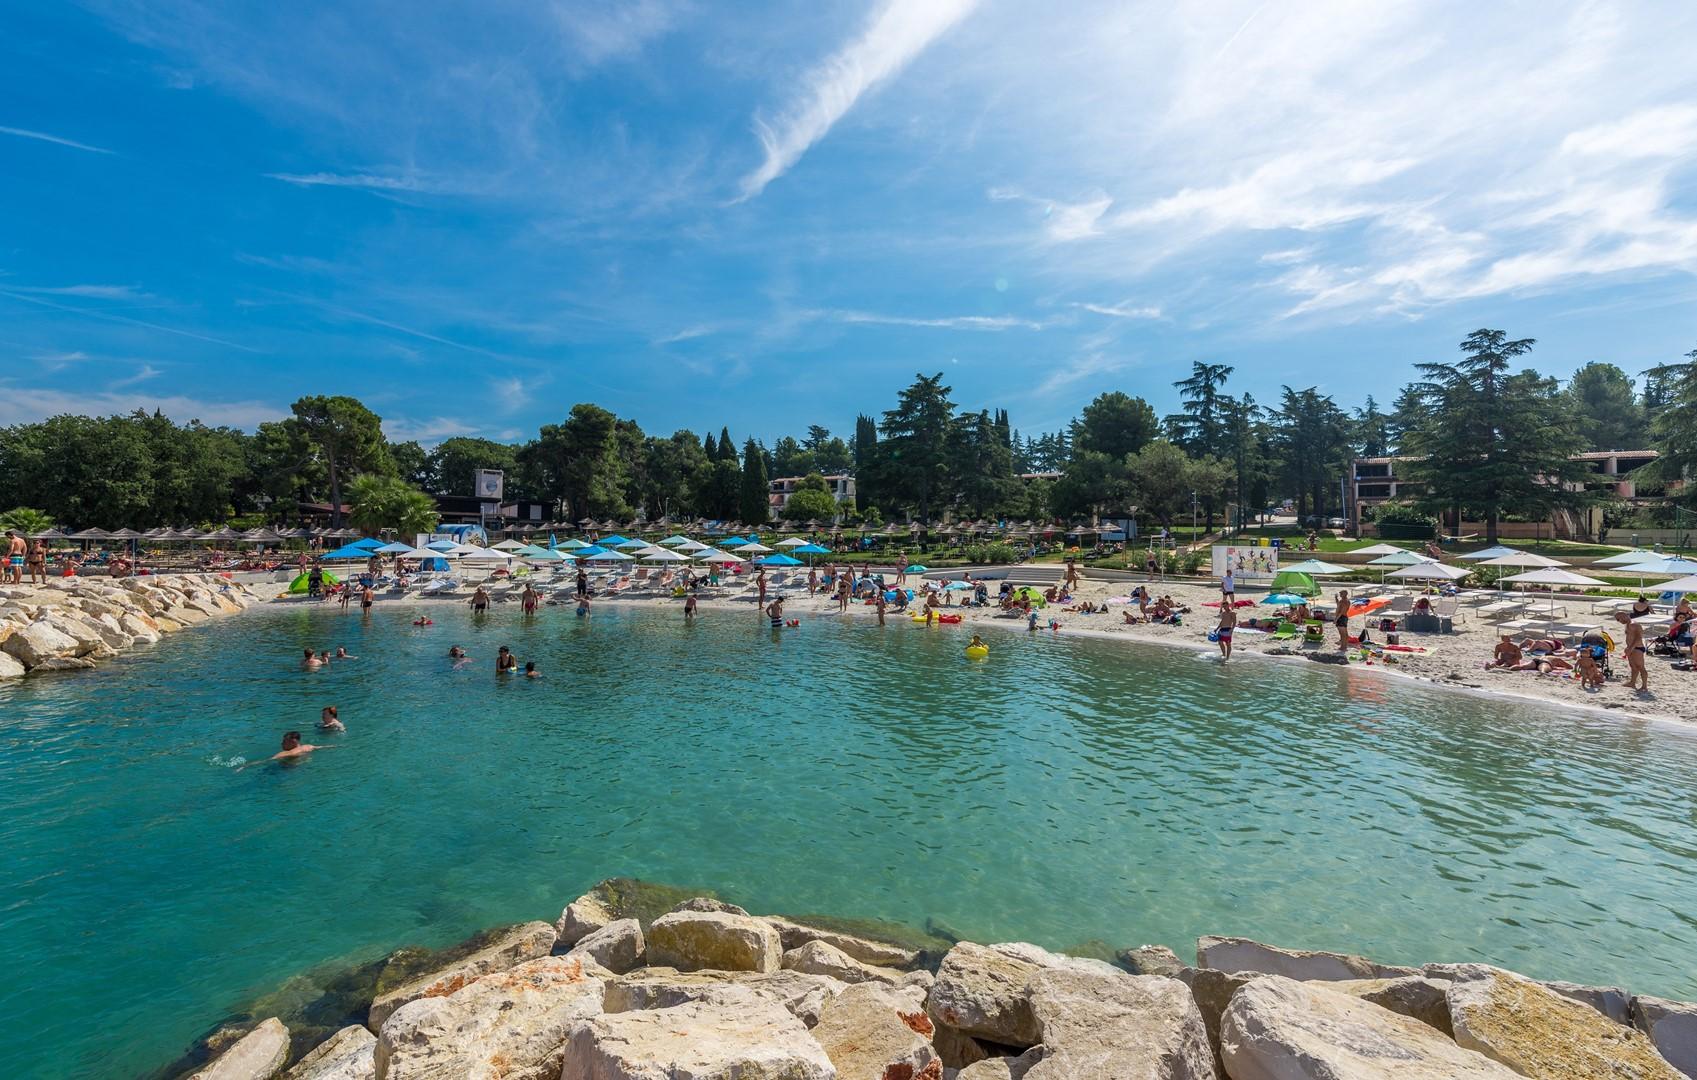 Ferienhaus Villa Cecilia mit privatem Pool in der Nähe von Aquacolors (2240240), Mugeba, , Istrien, Kroatien, Bild 25